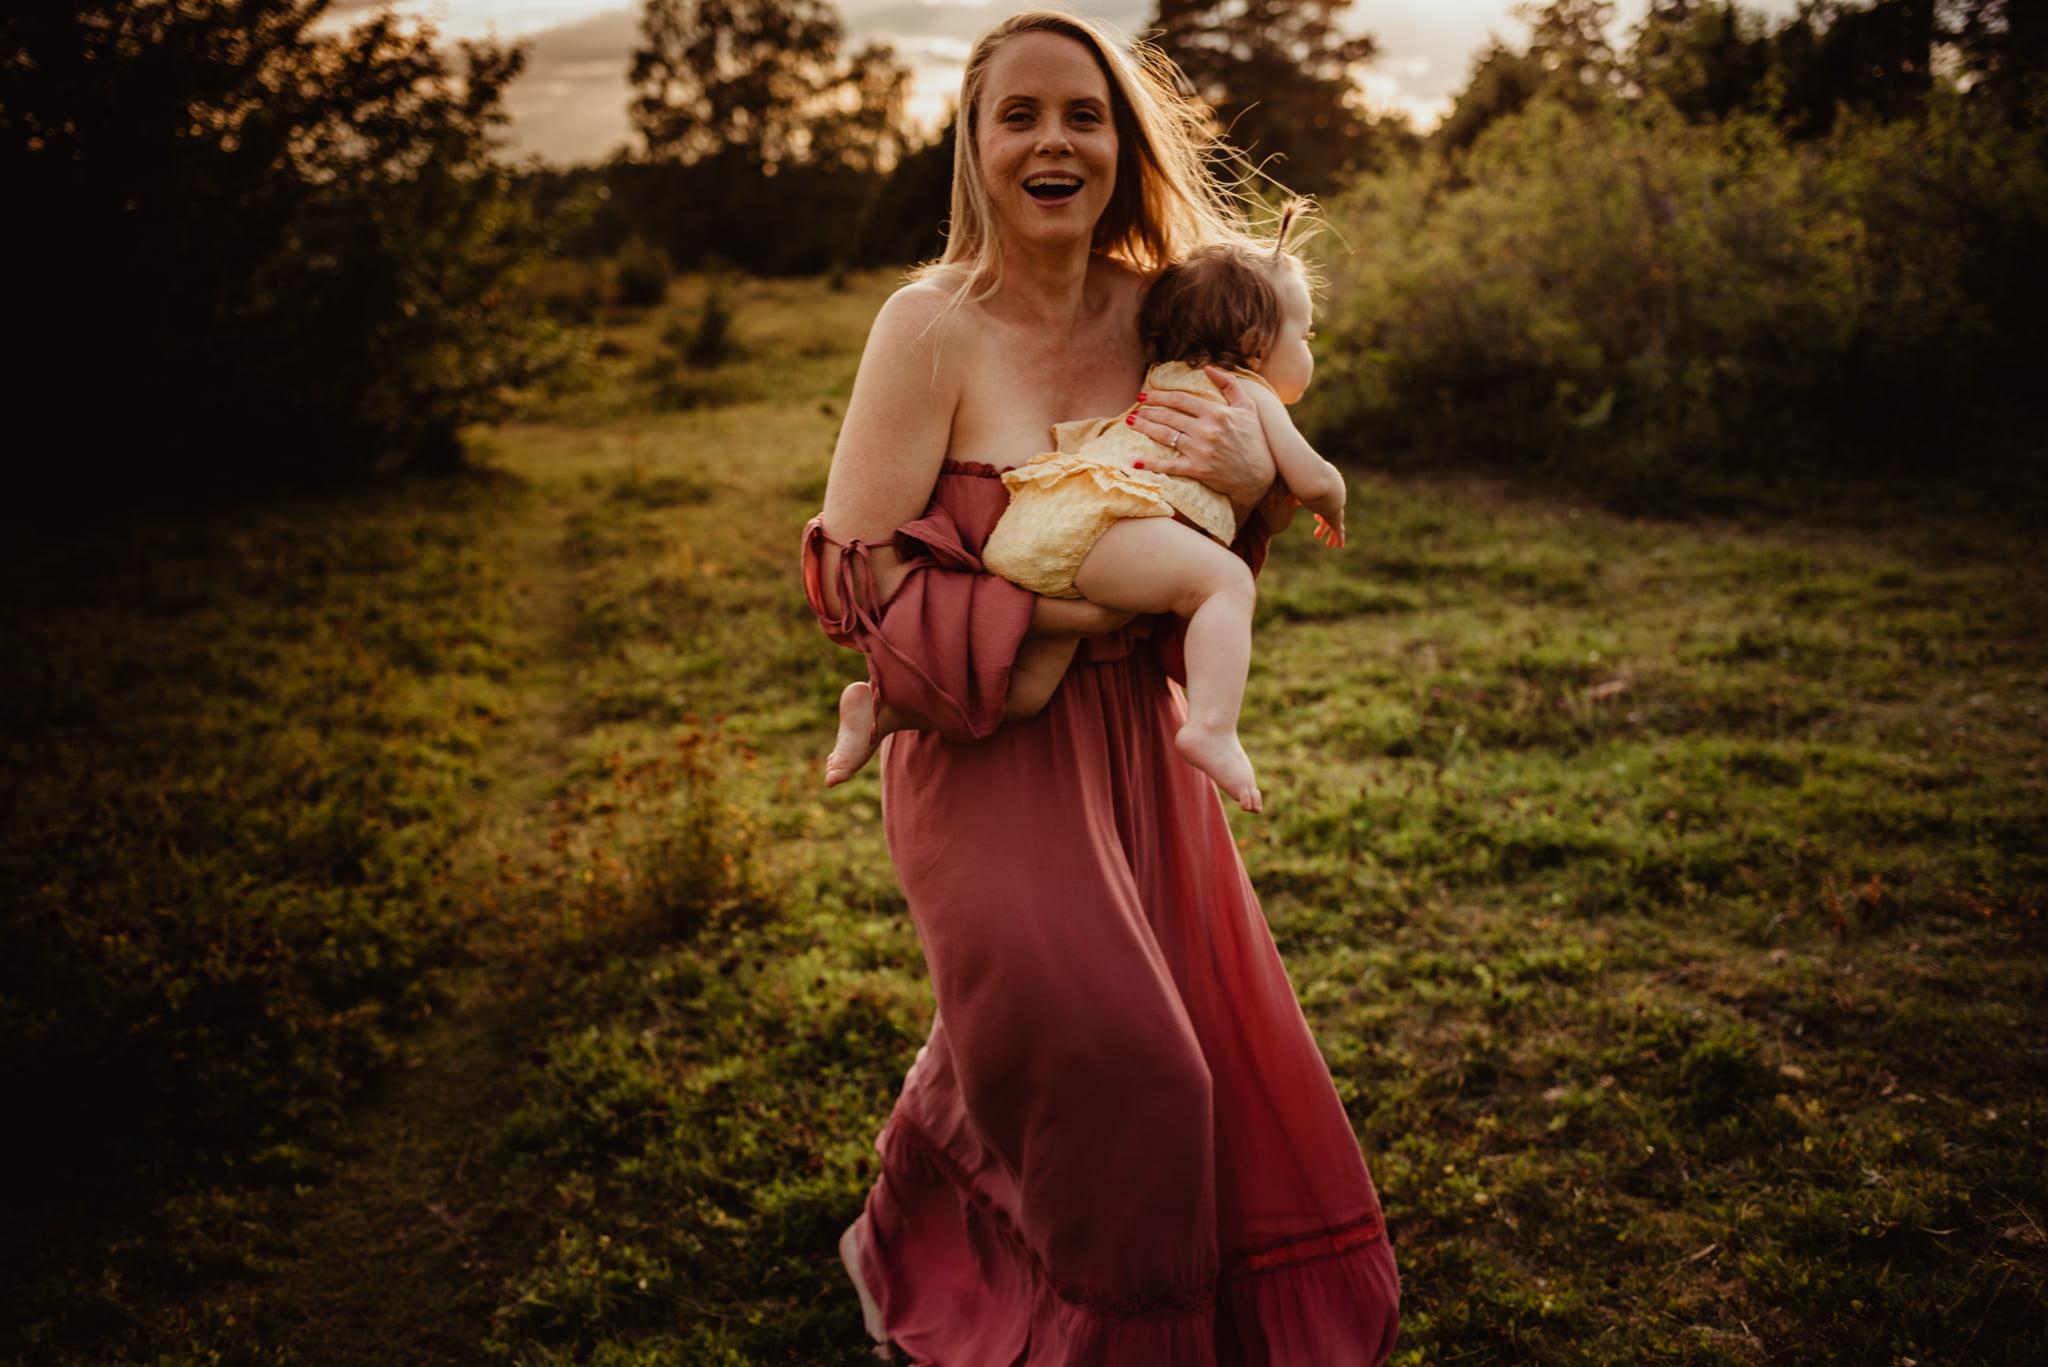 Familjefotografering Stockholm - Jasmine 9